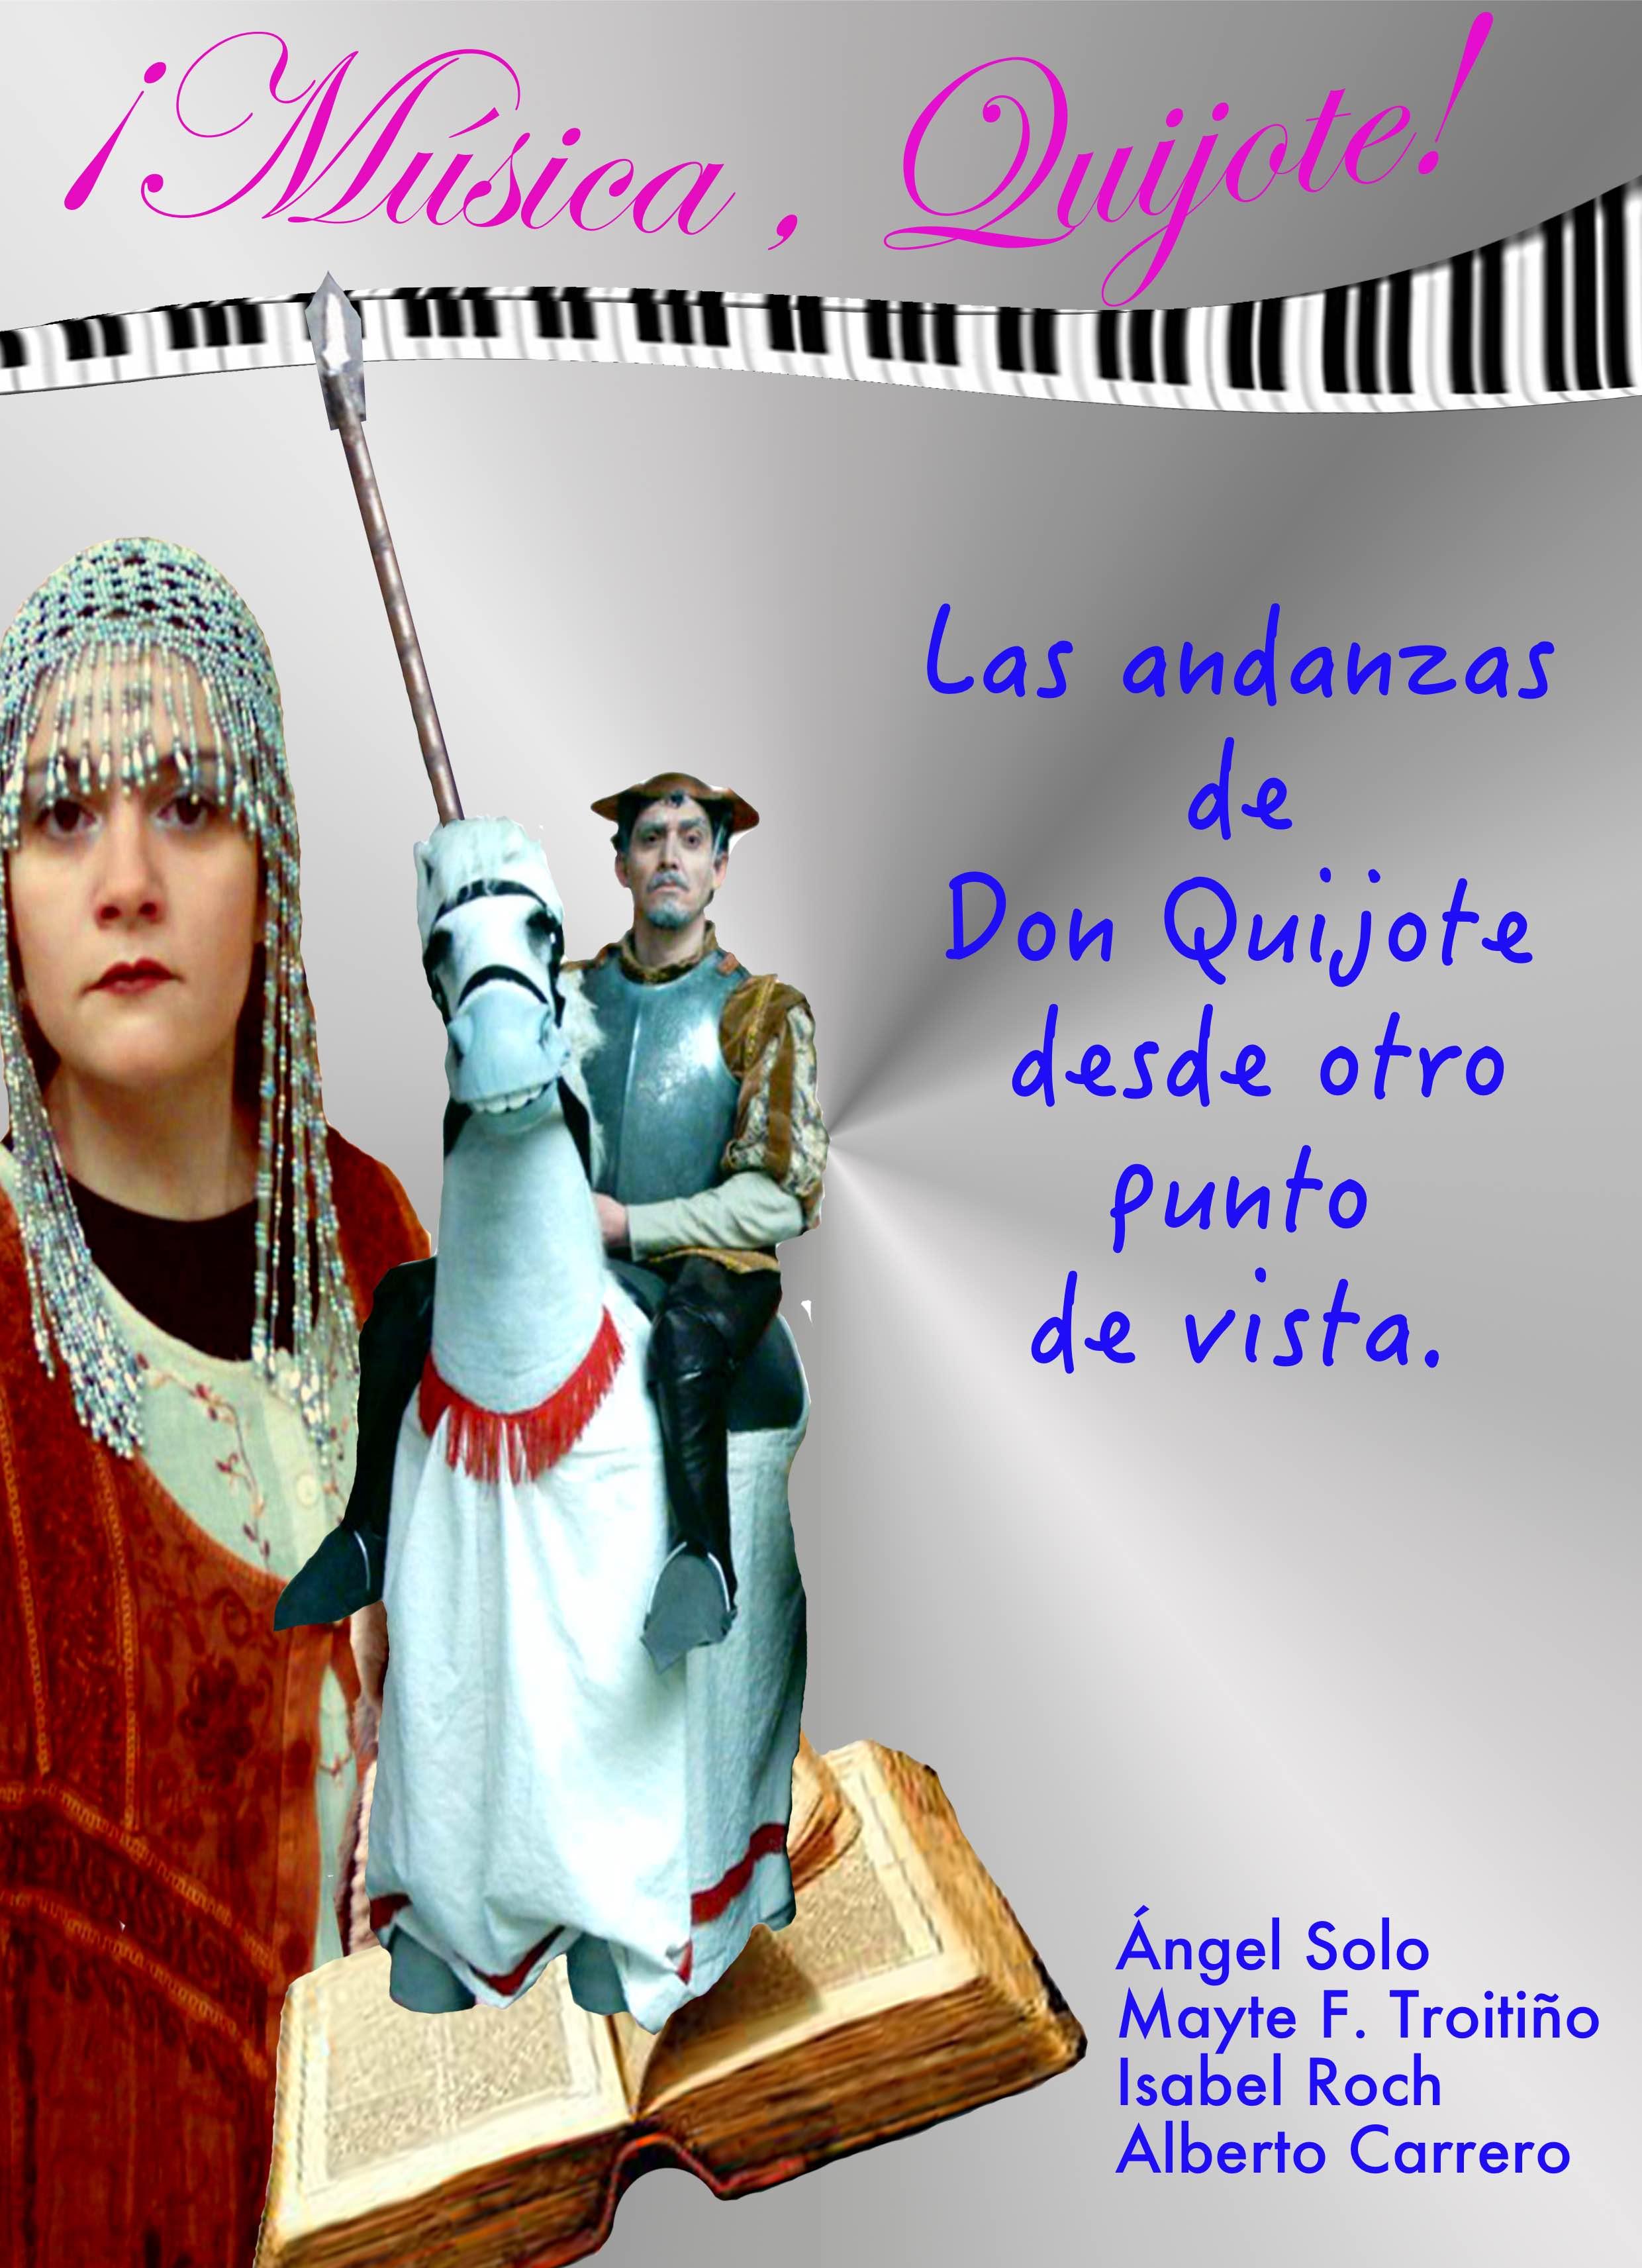 Don Quijote Andante2